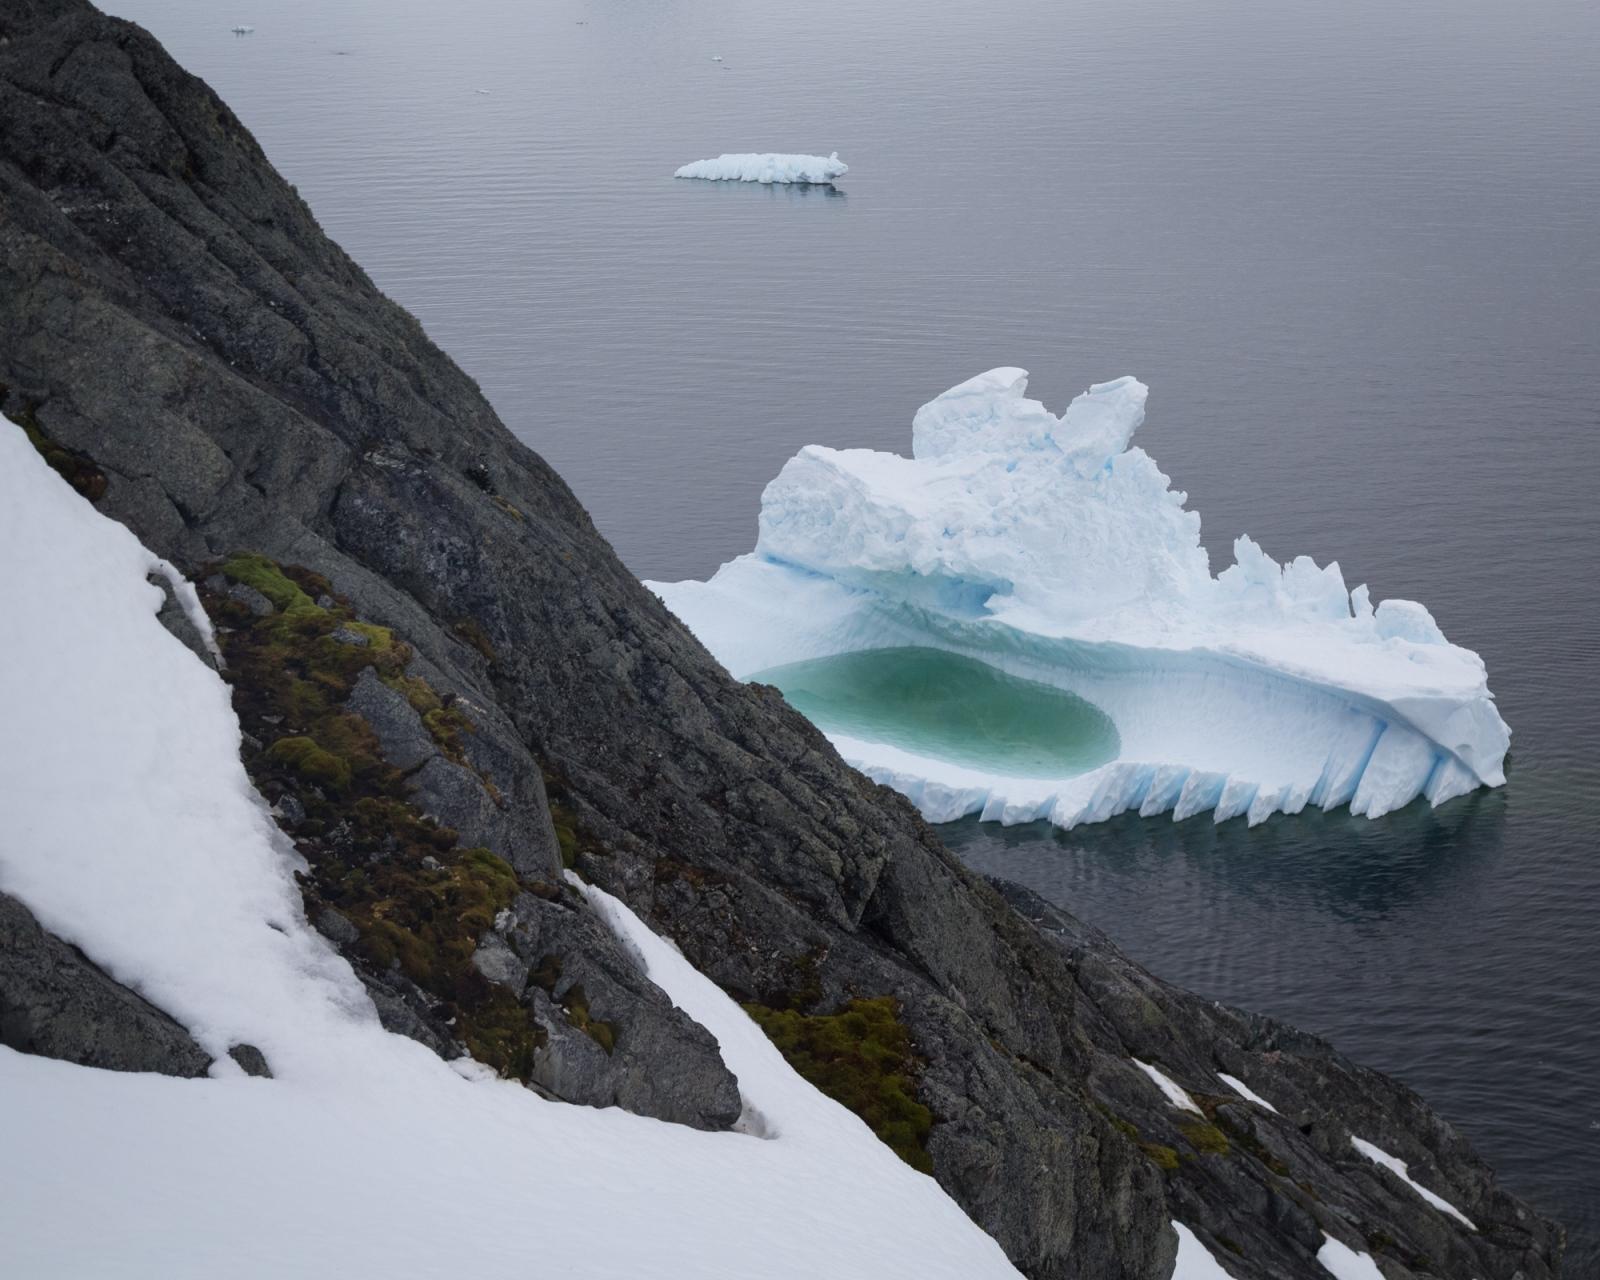 Art and Documentary Photography - Loading 0_Antarctica_UPLOAD_acaciajohnson_23.jpg